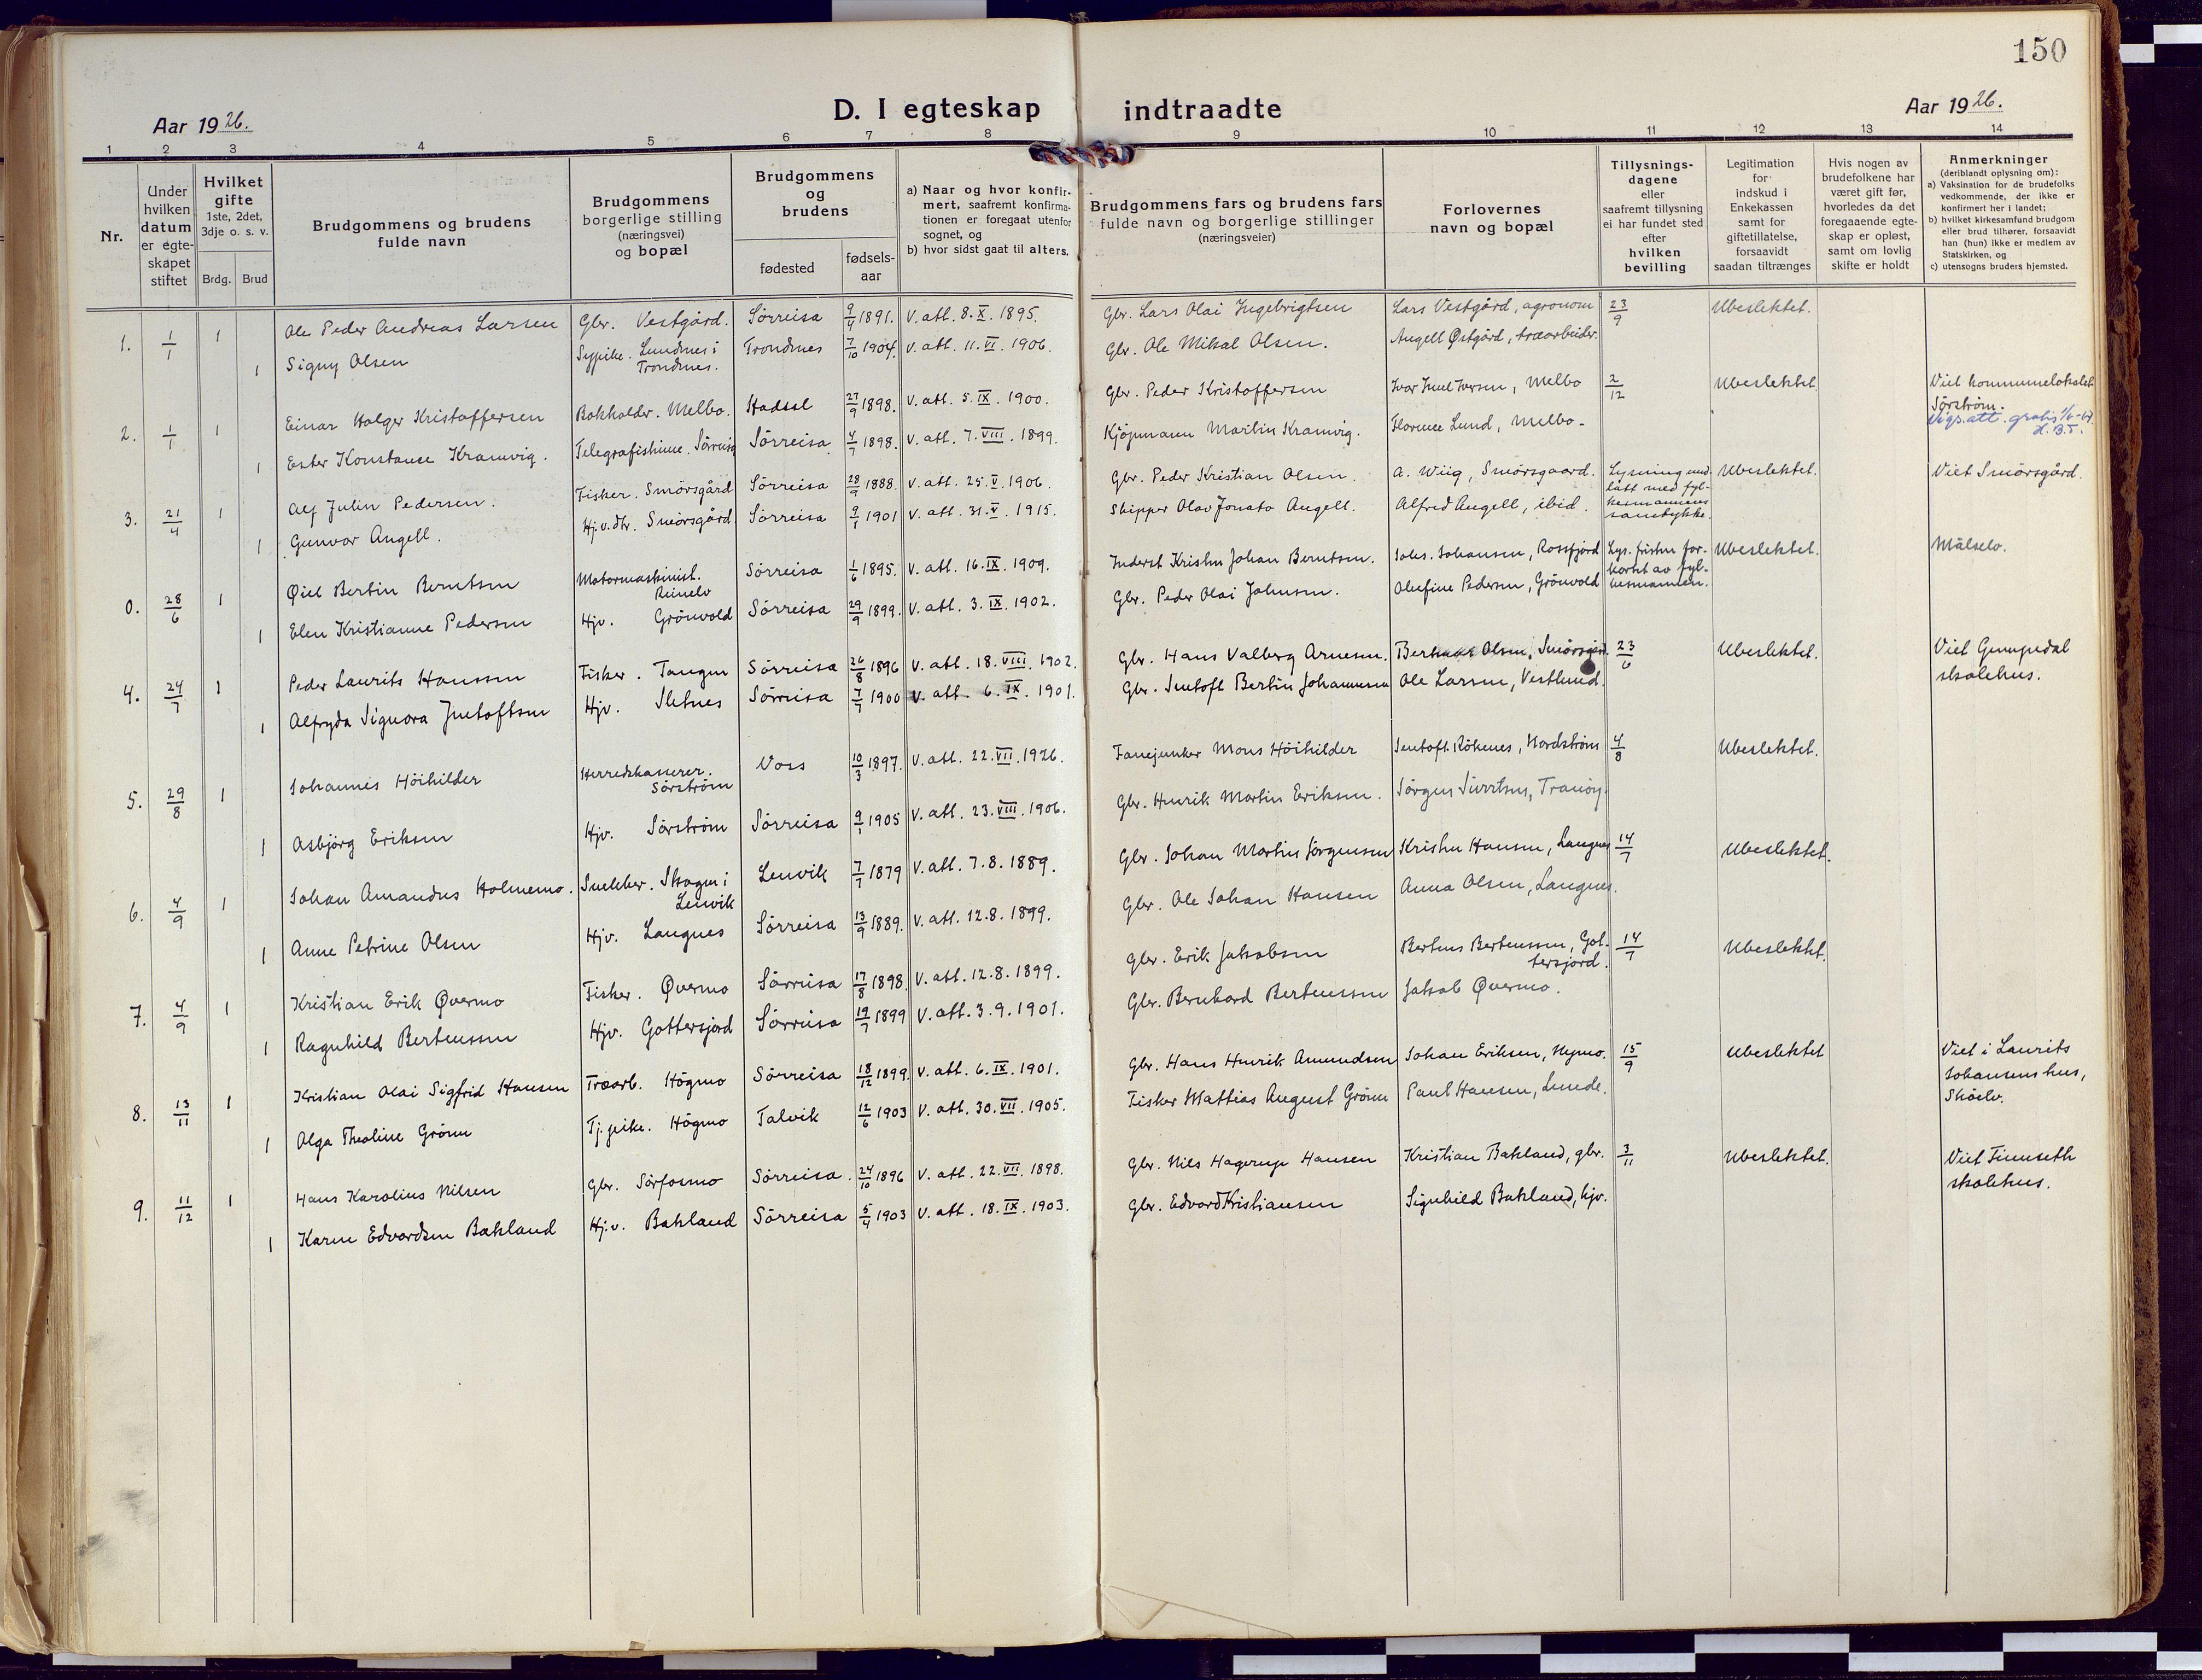 SATØ, Tranøy sokneprestkontor, I/Ia/Iaa/L0015kirke: Ministerialbok nr. 15, 1919-1928, s. 150